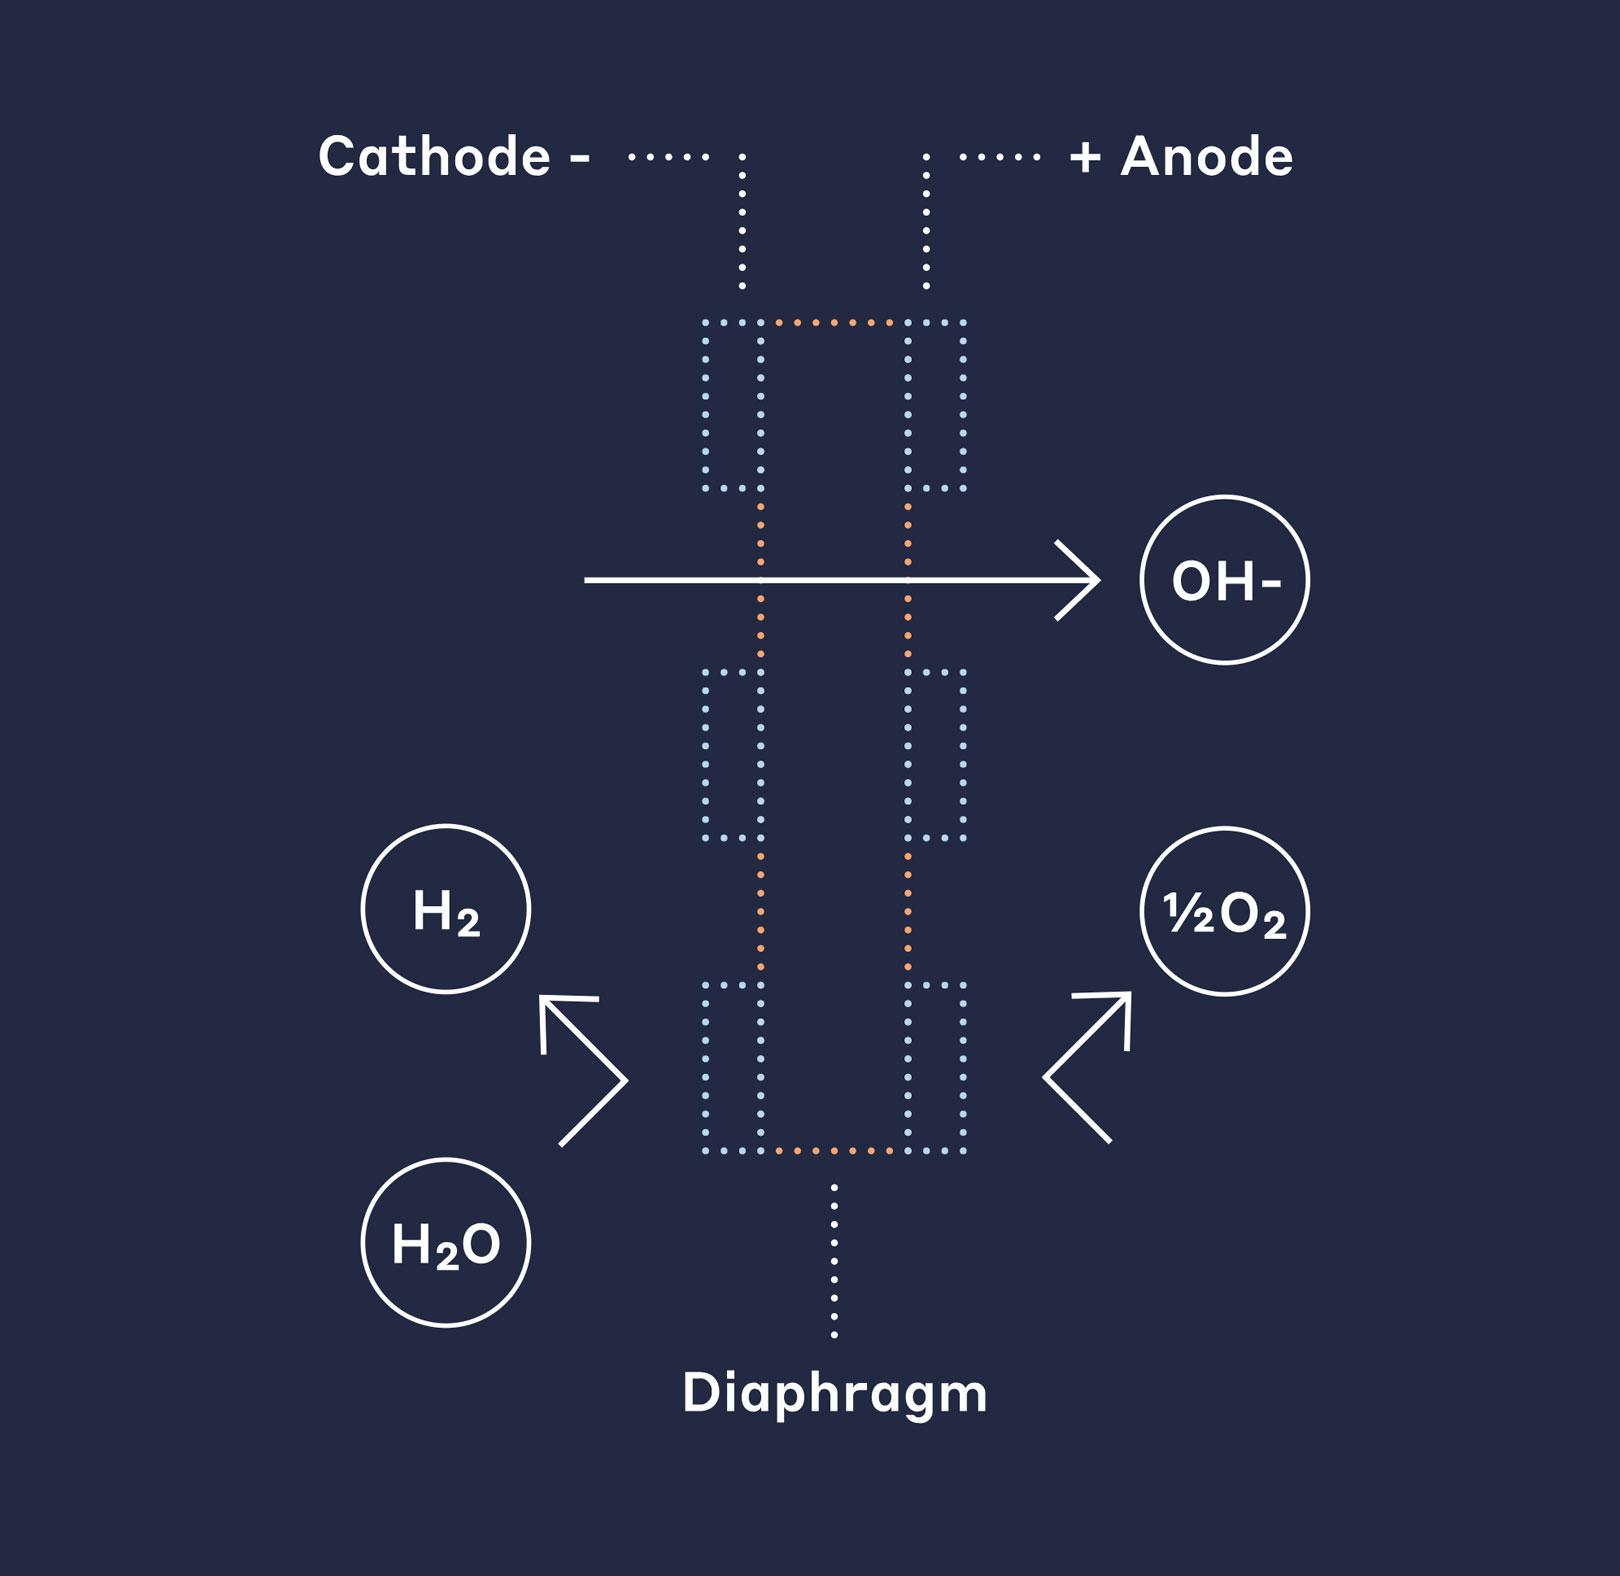 Traditional Alkaline Electrolyzer